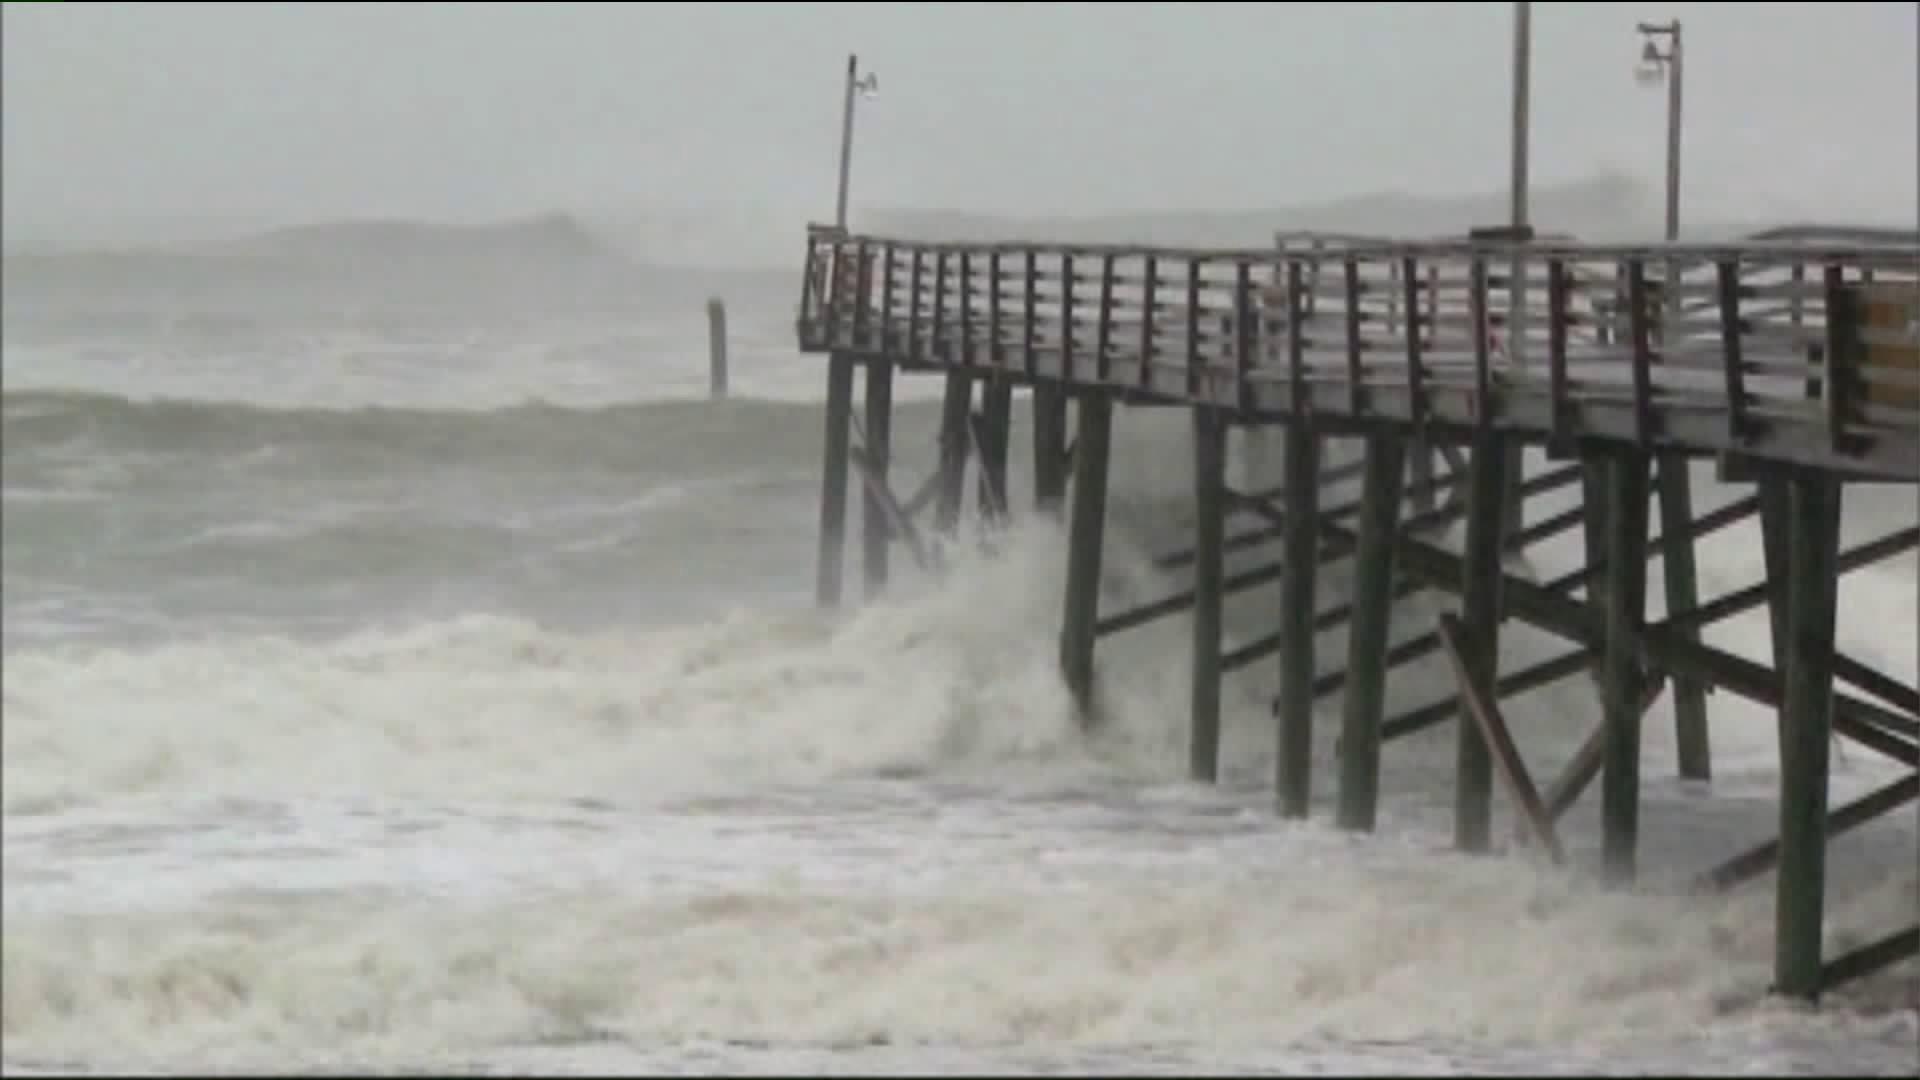 NHC: Tropical Storm Fay forms east of North Carolina